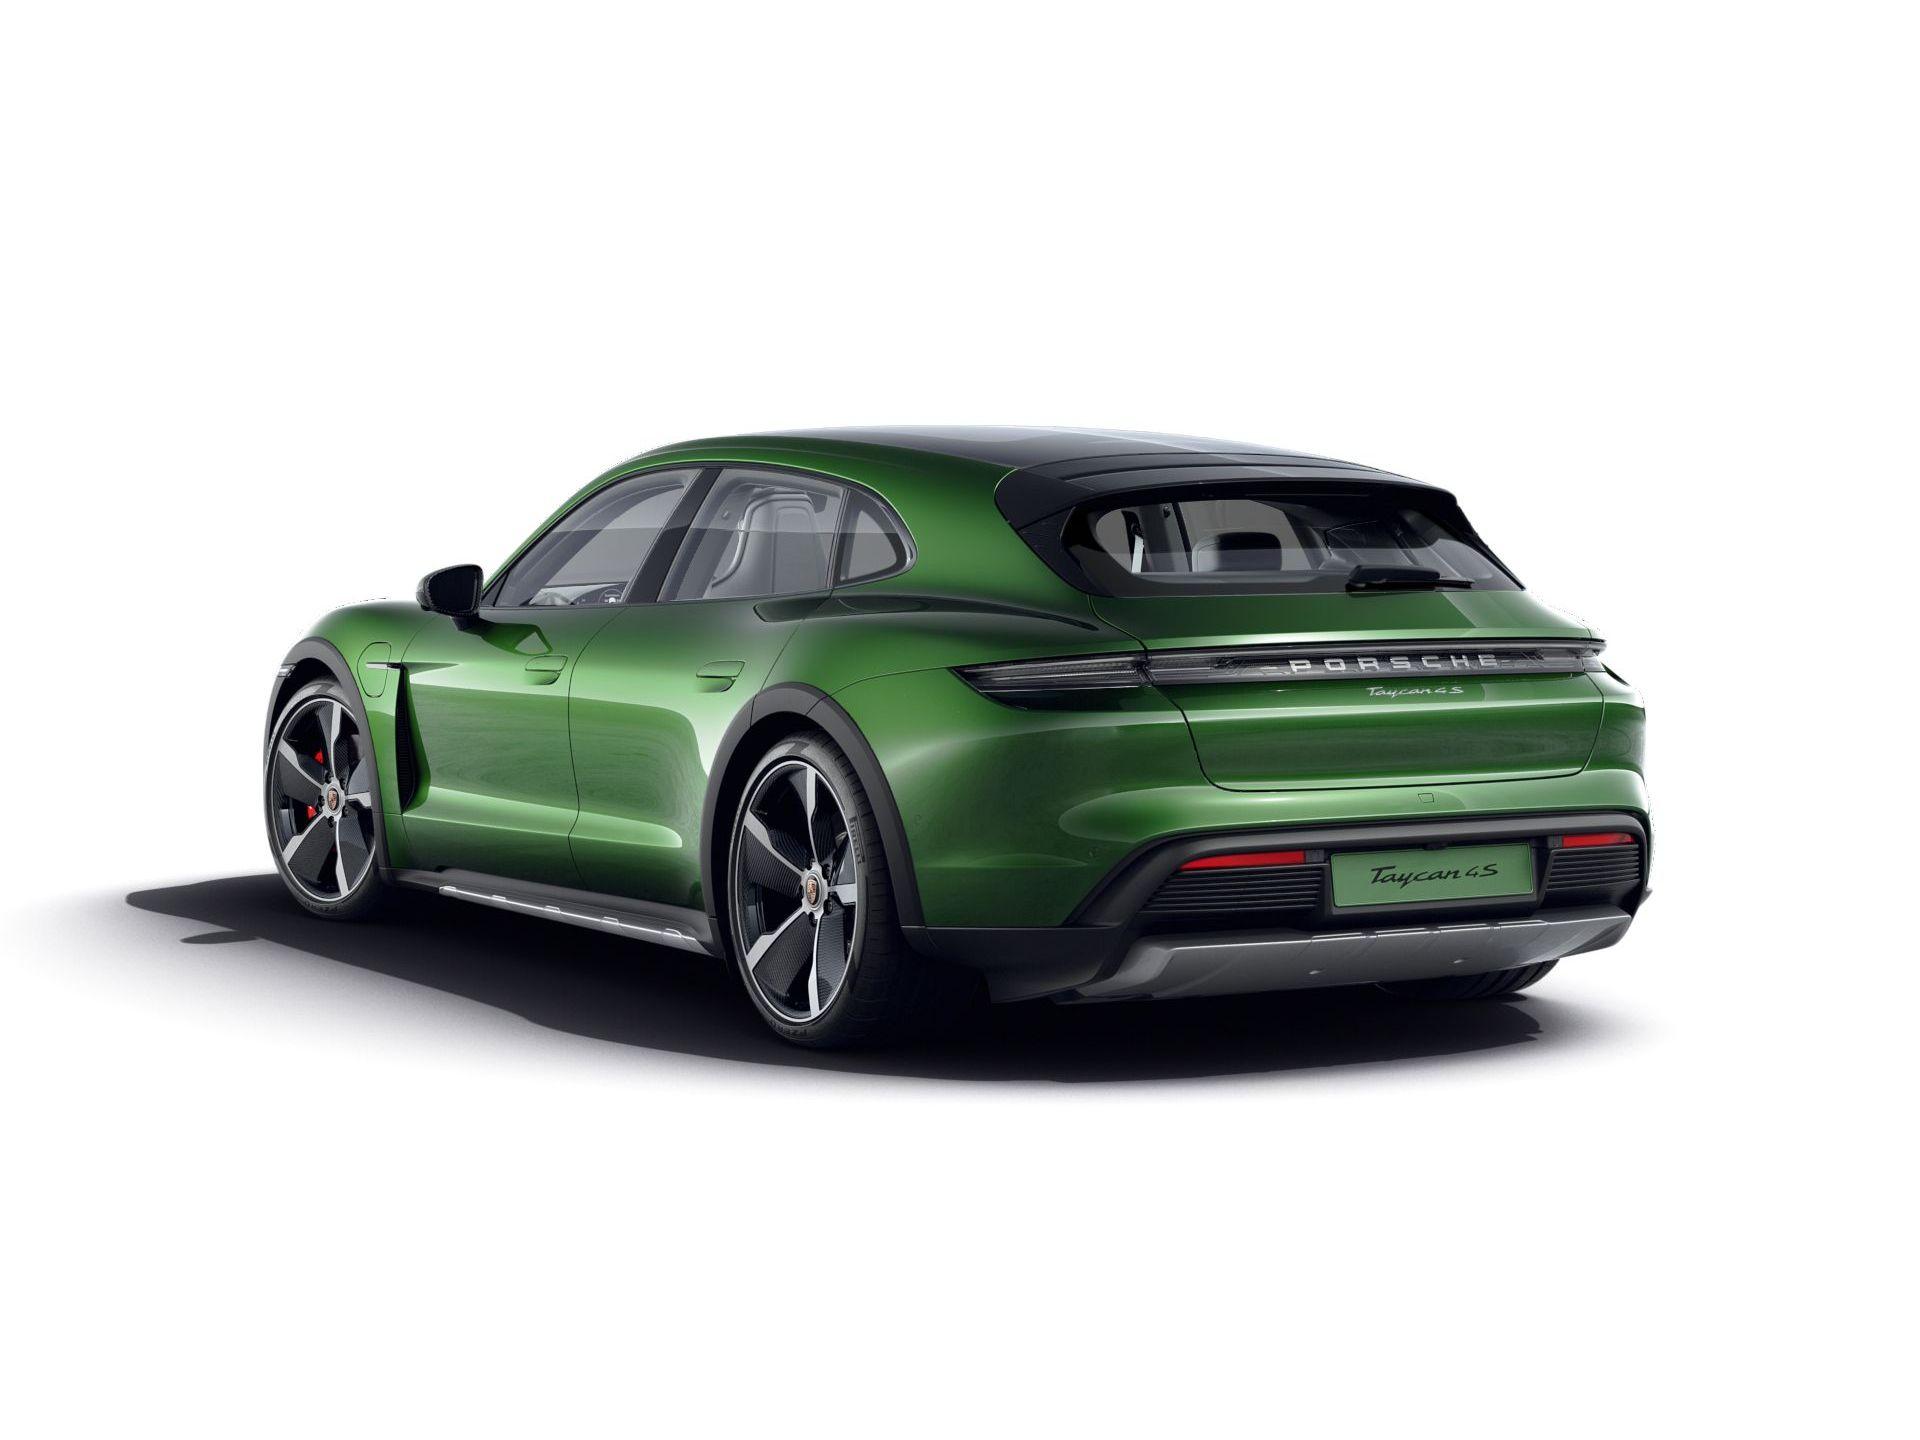 2021 Porsche Taycan 4S Cross Turismo – 3